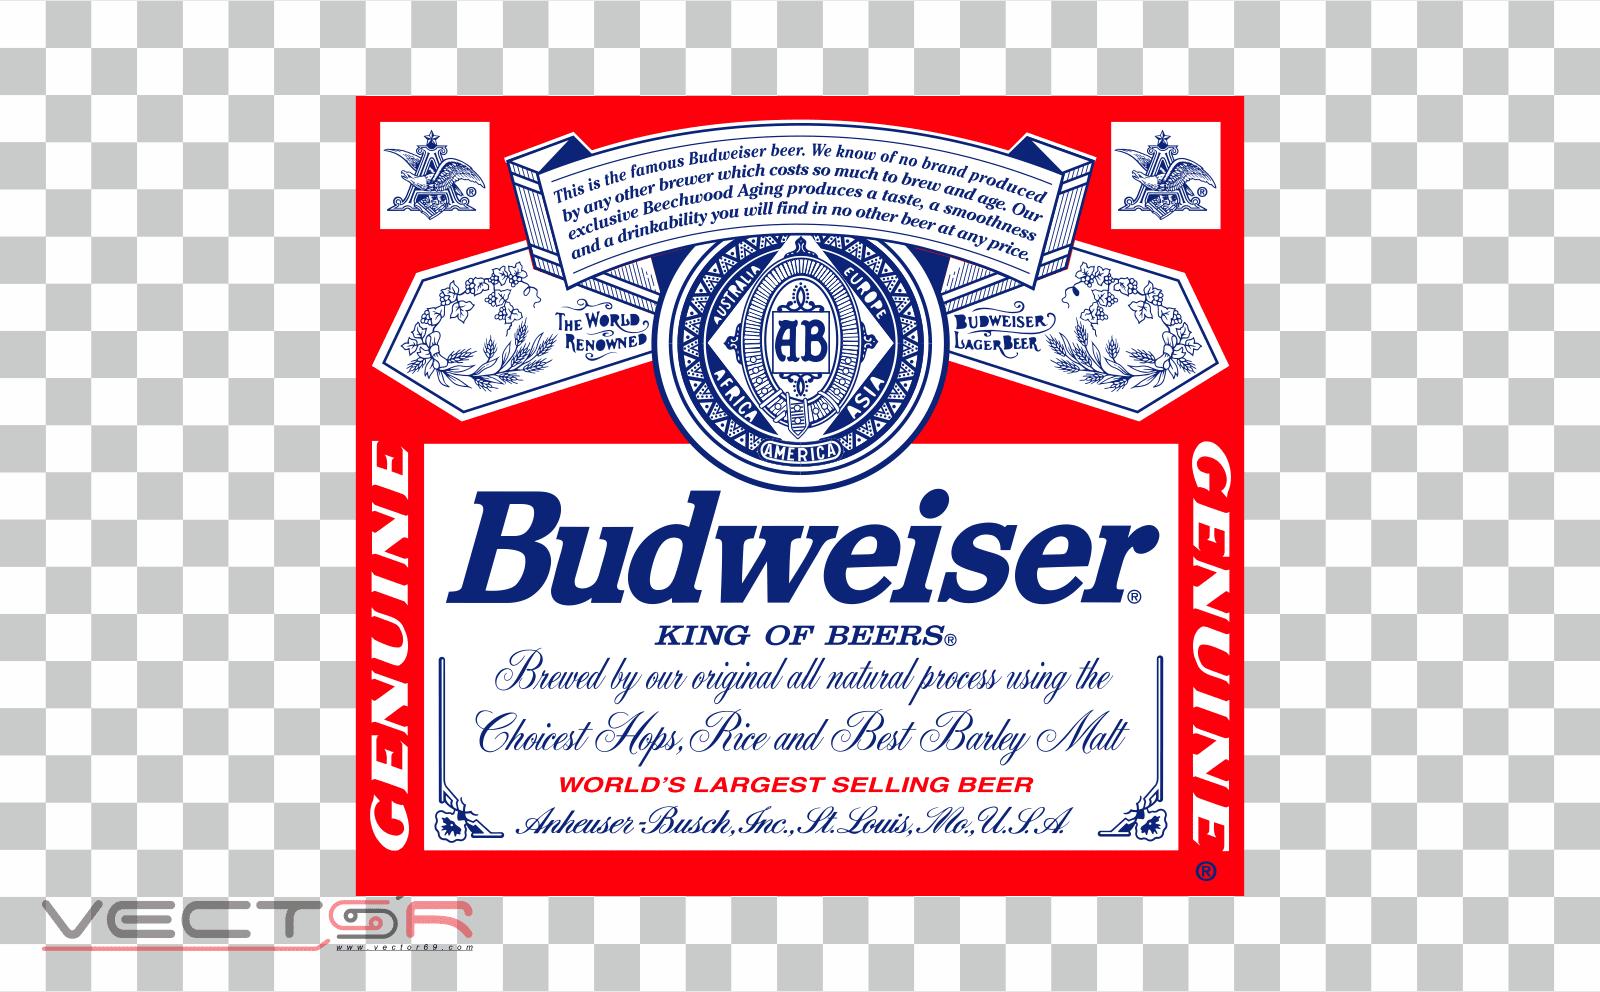 Budweiser (1987-1999) Label - Download .PNG (Portable Network Graphics) Transparent Images